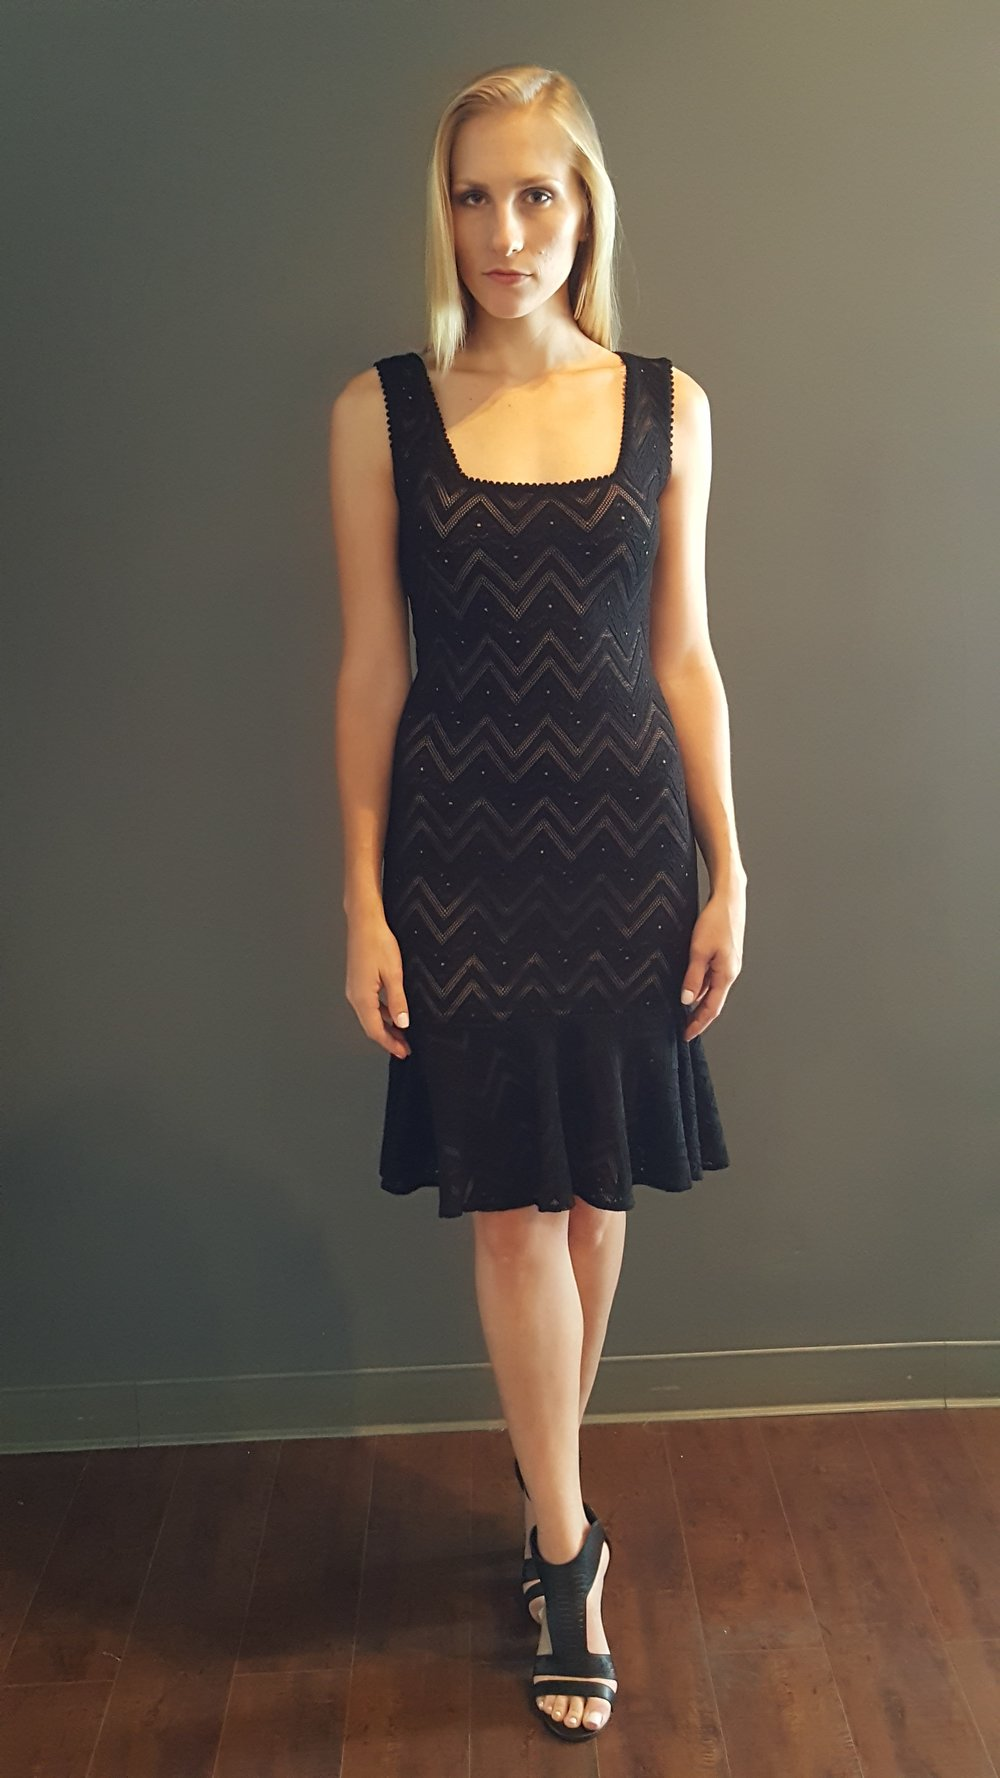 Square-Neck Chevron Knit Dress